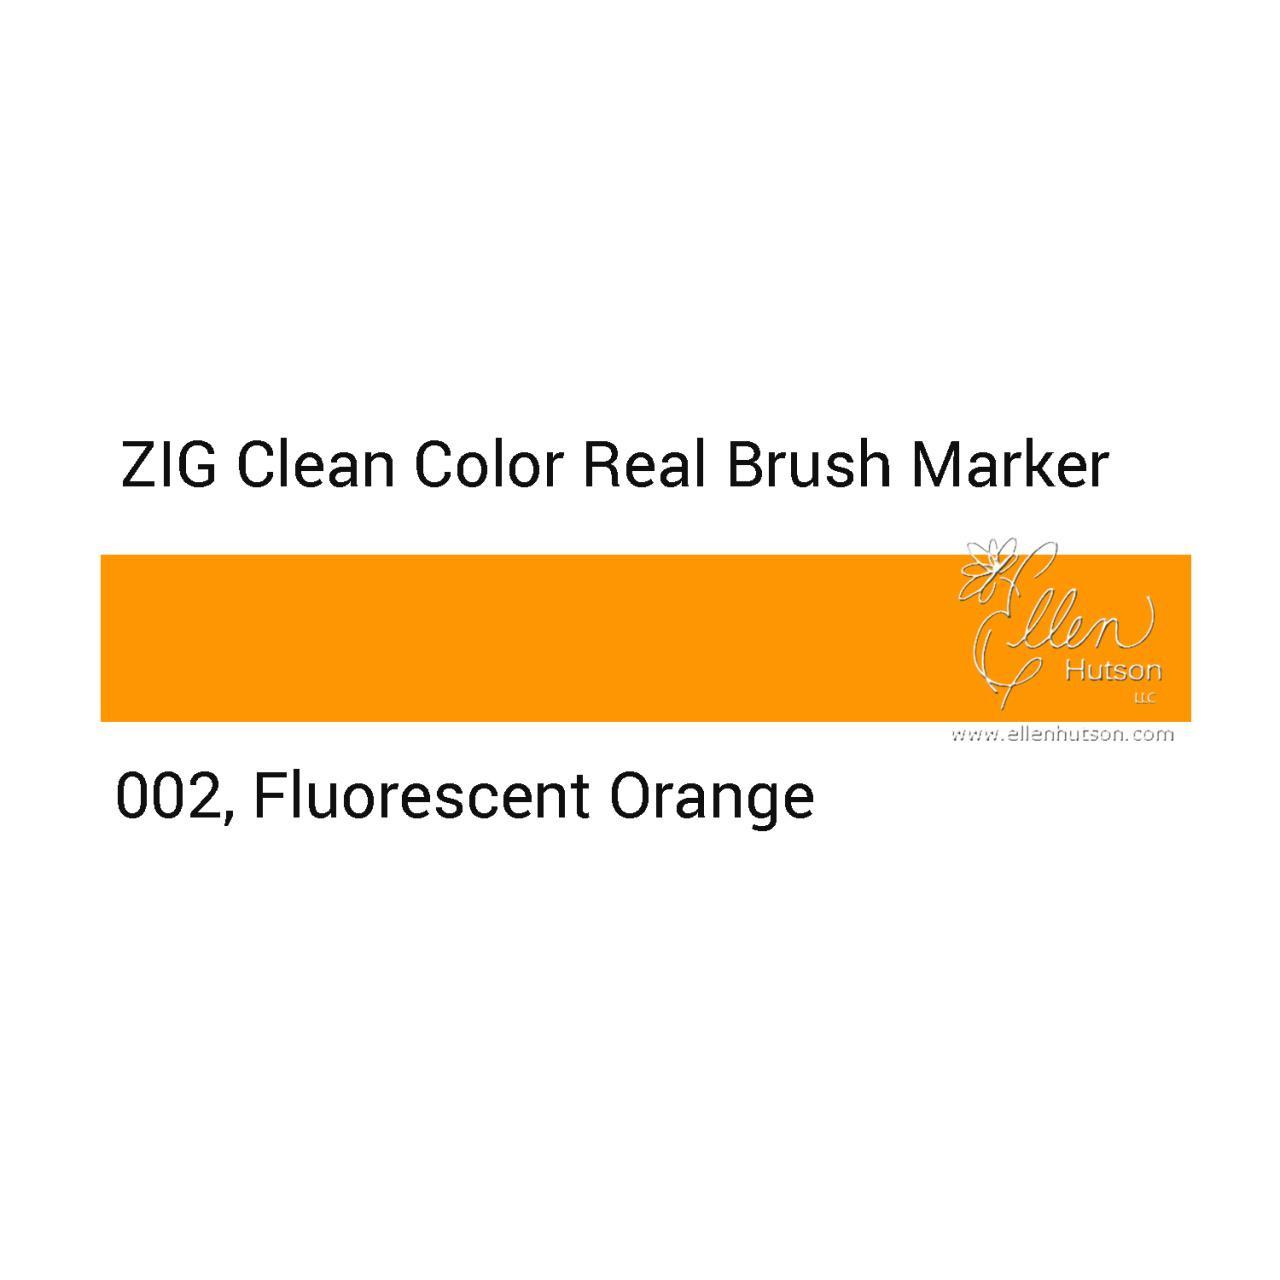 002 - Fluorescent Orange, ZIG Clean Color Real Brush Marker -